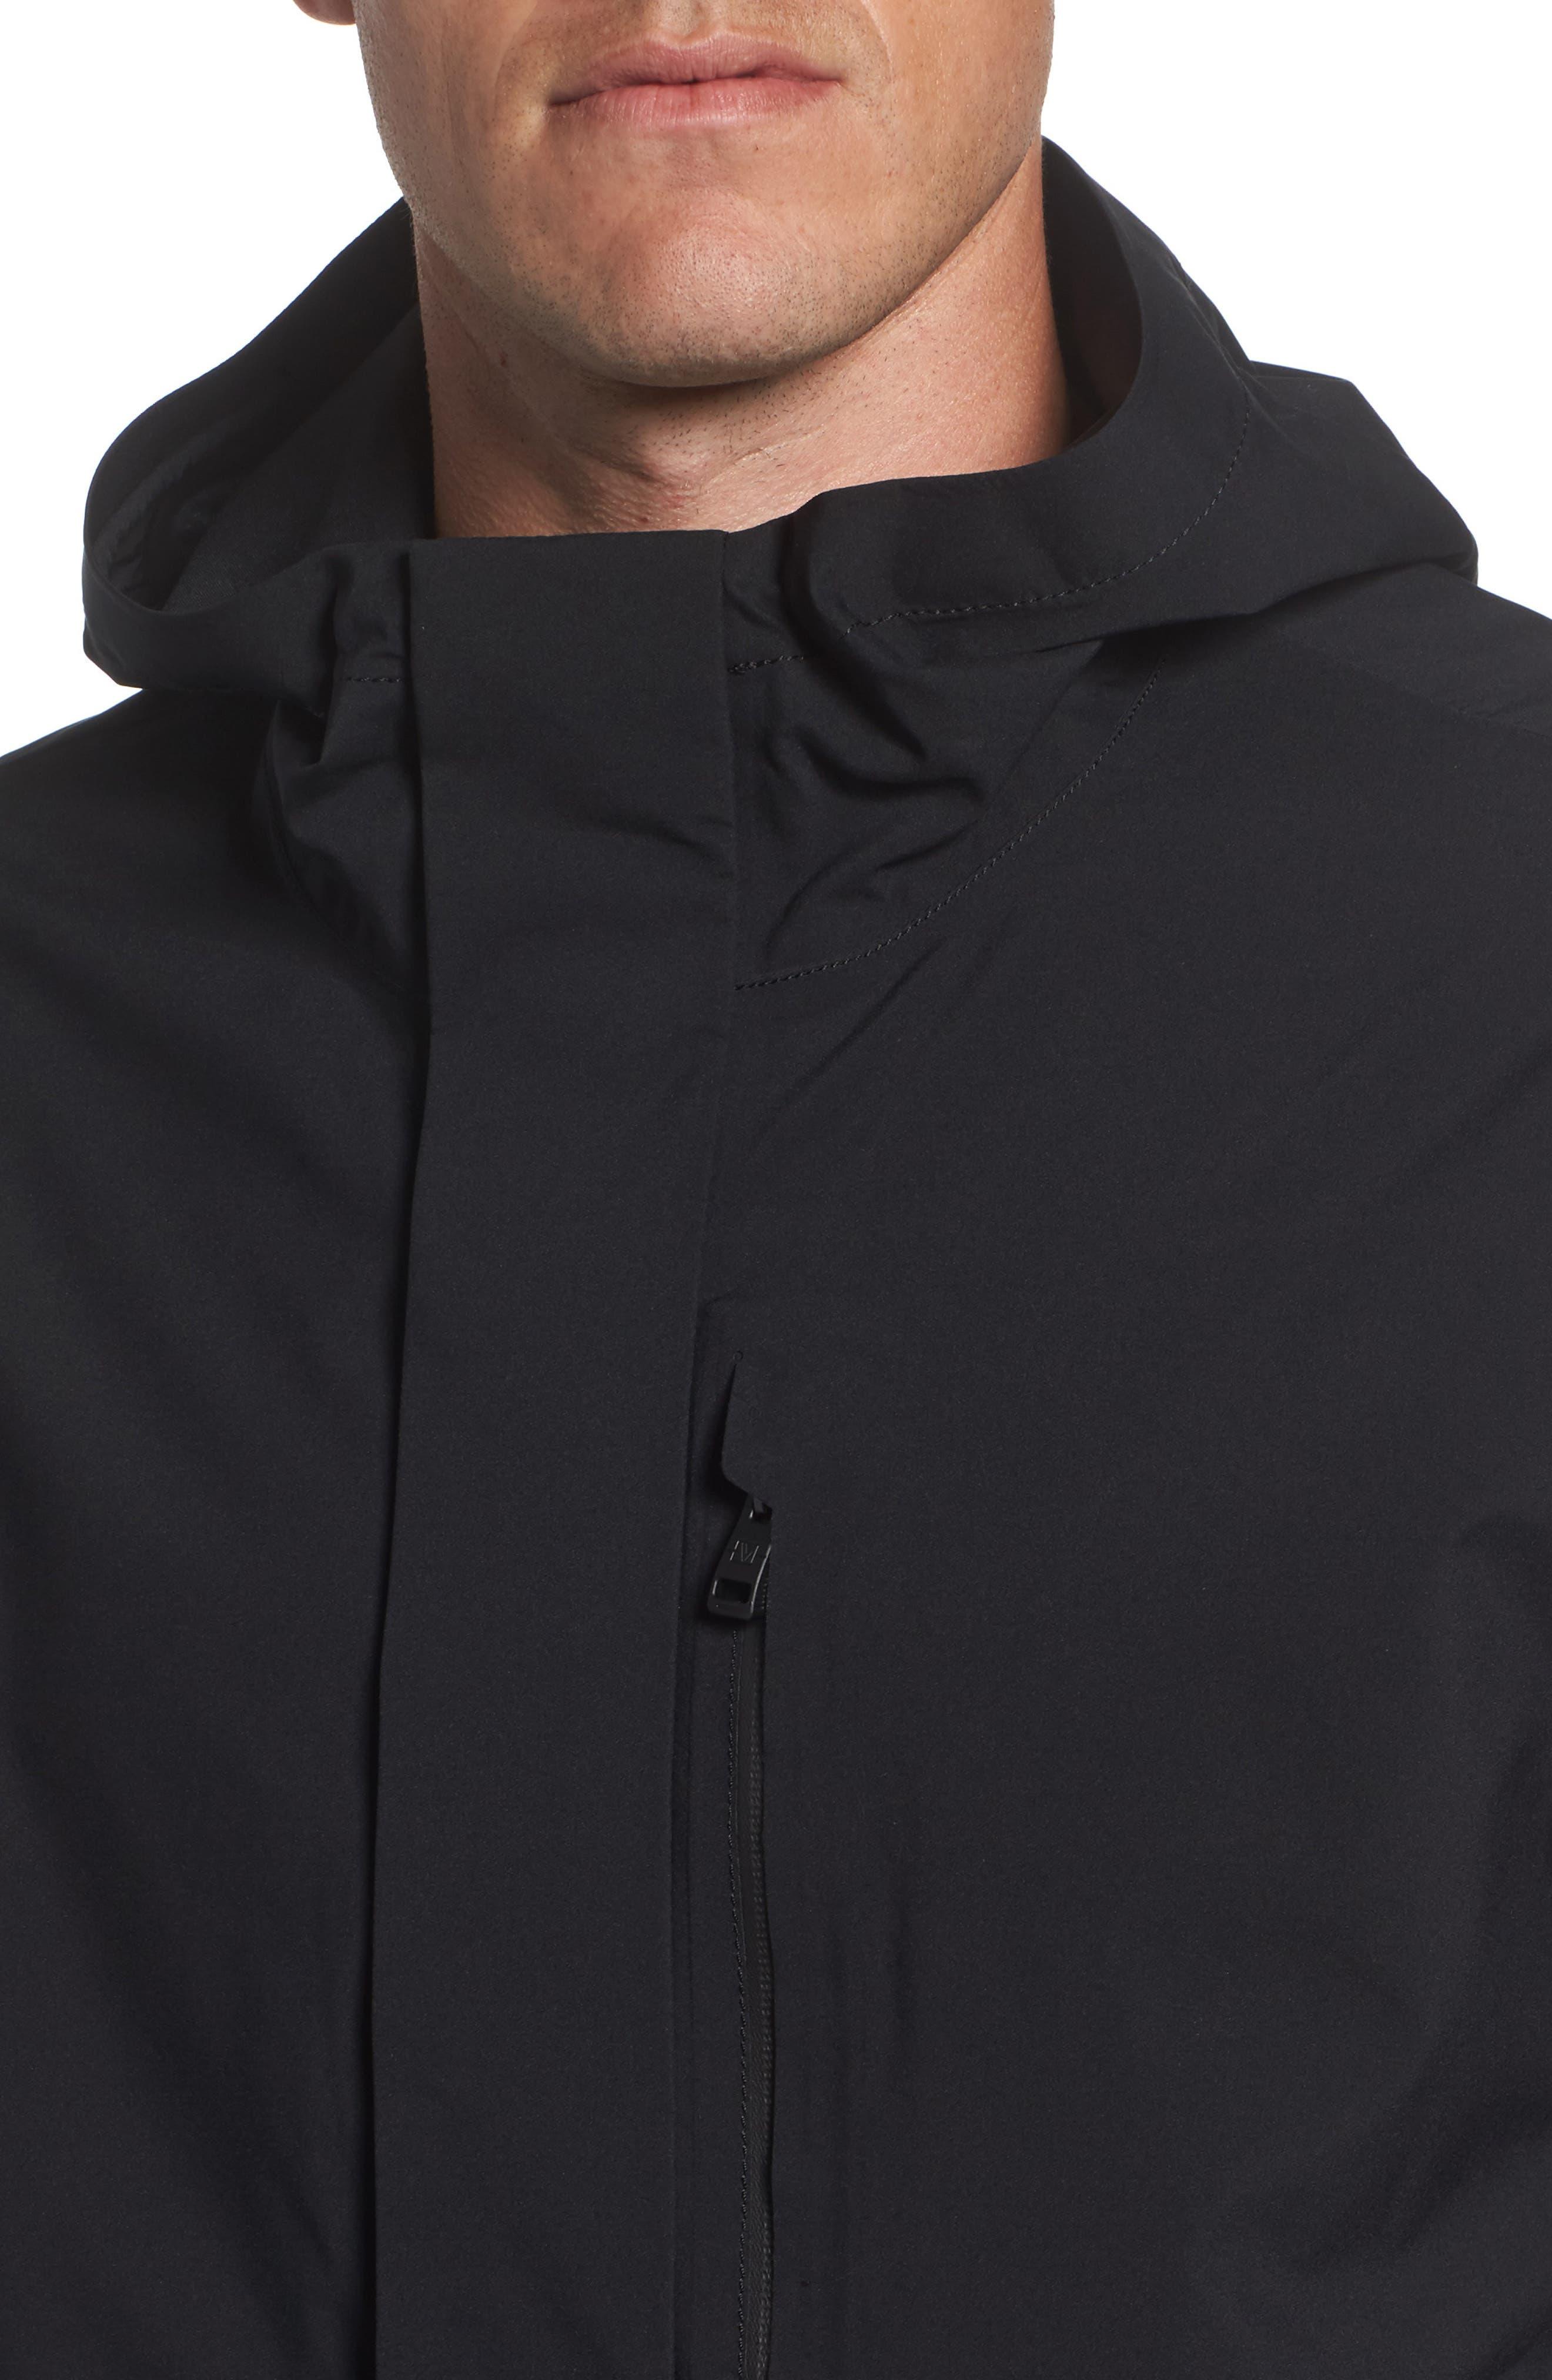 Marc New York Stratus Waterproof Hooded Rain Jacket,                             Alternate thumbnail 4, color,                             001